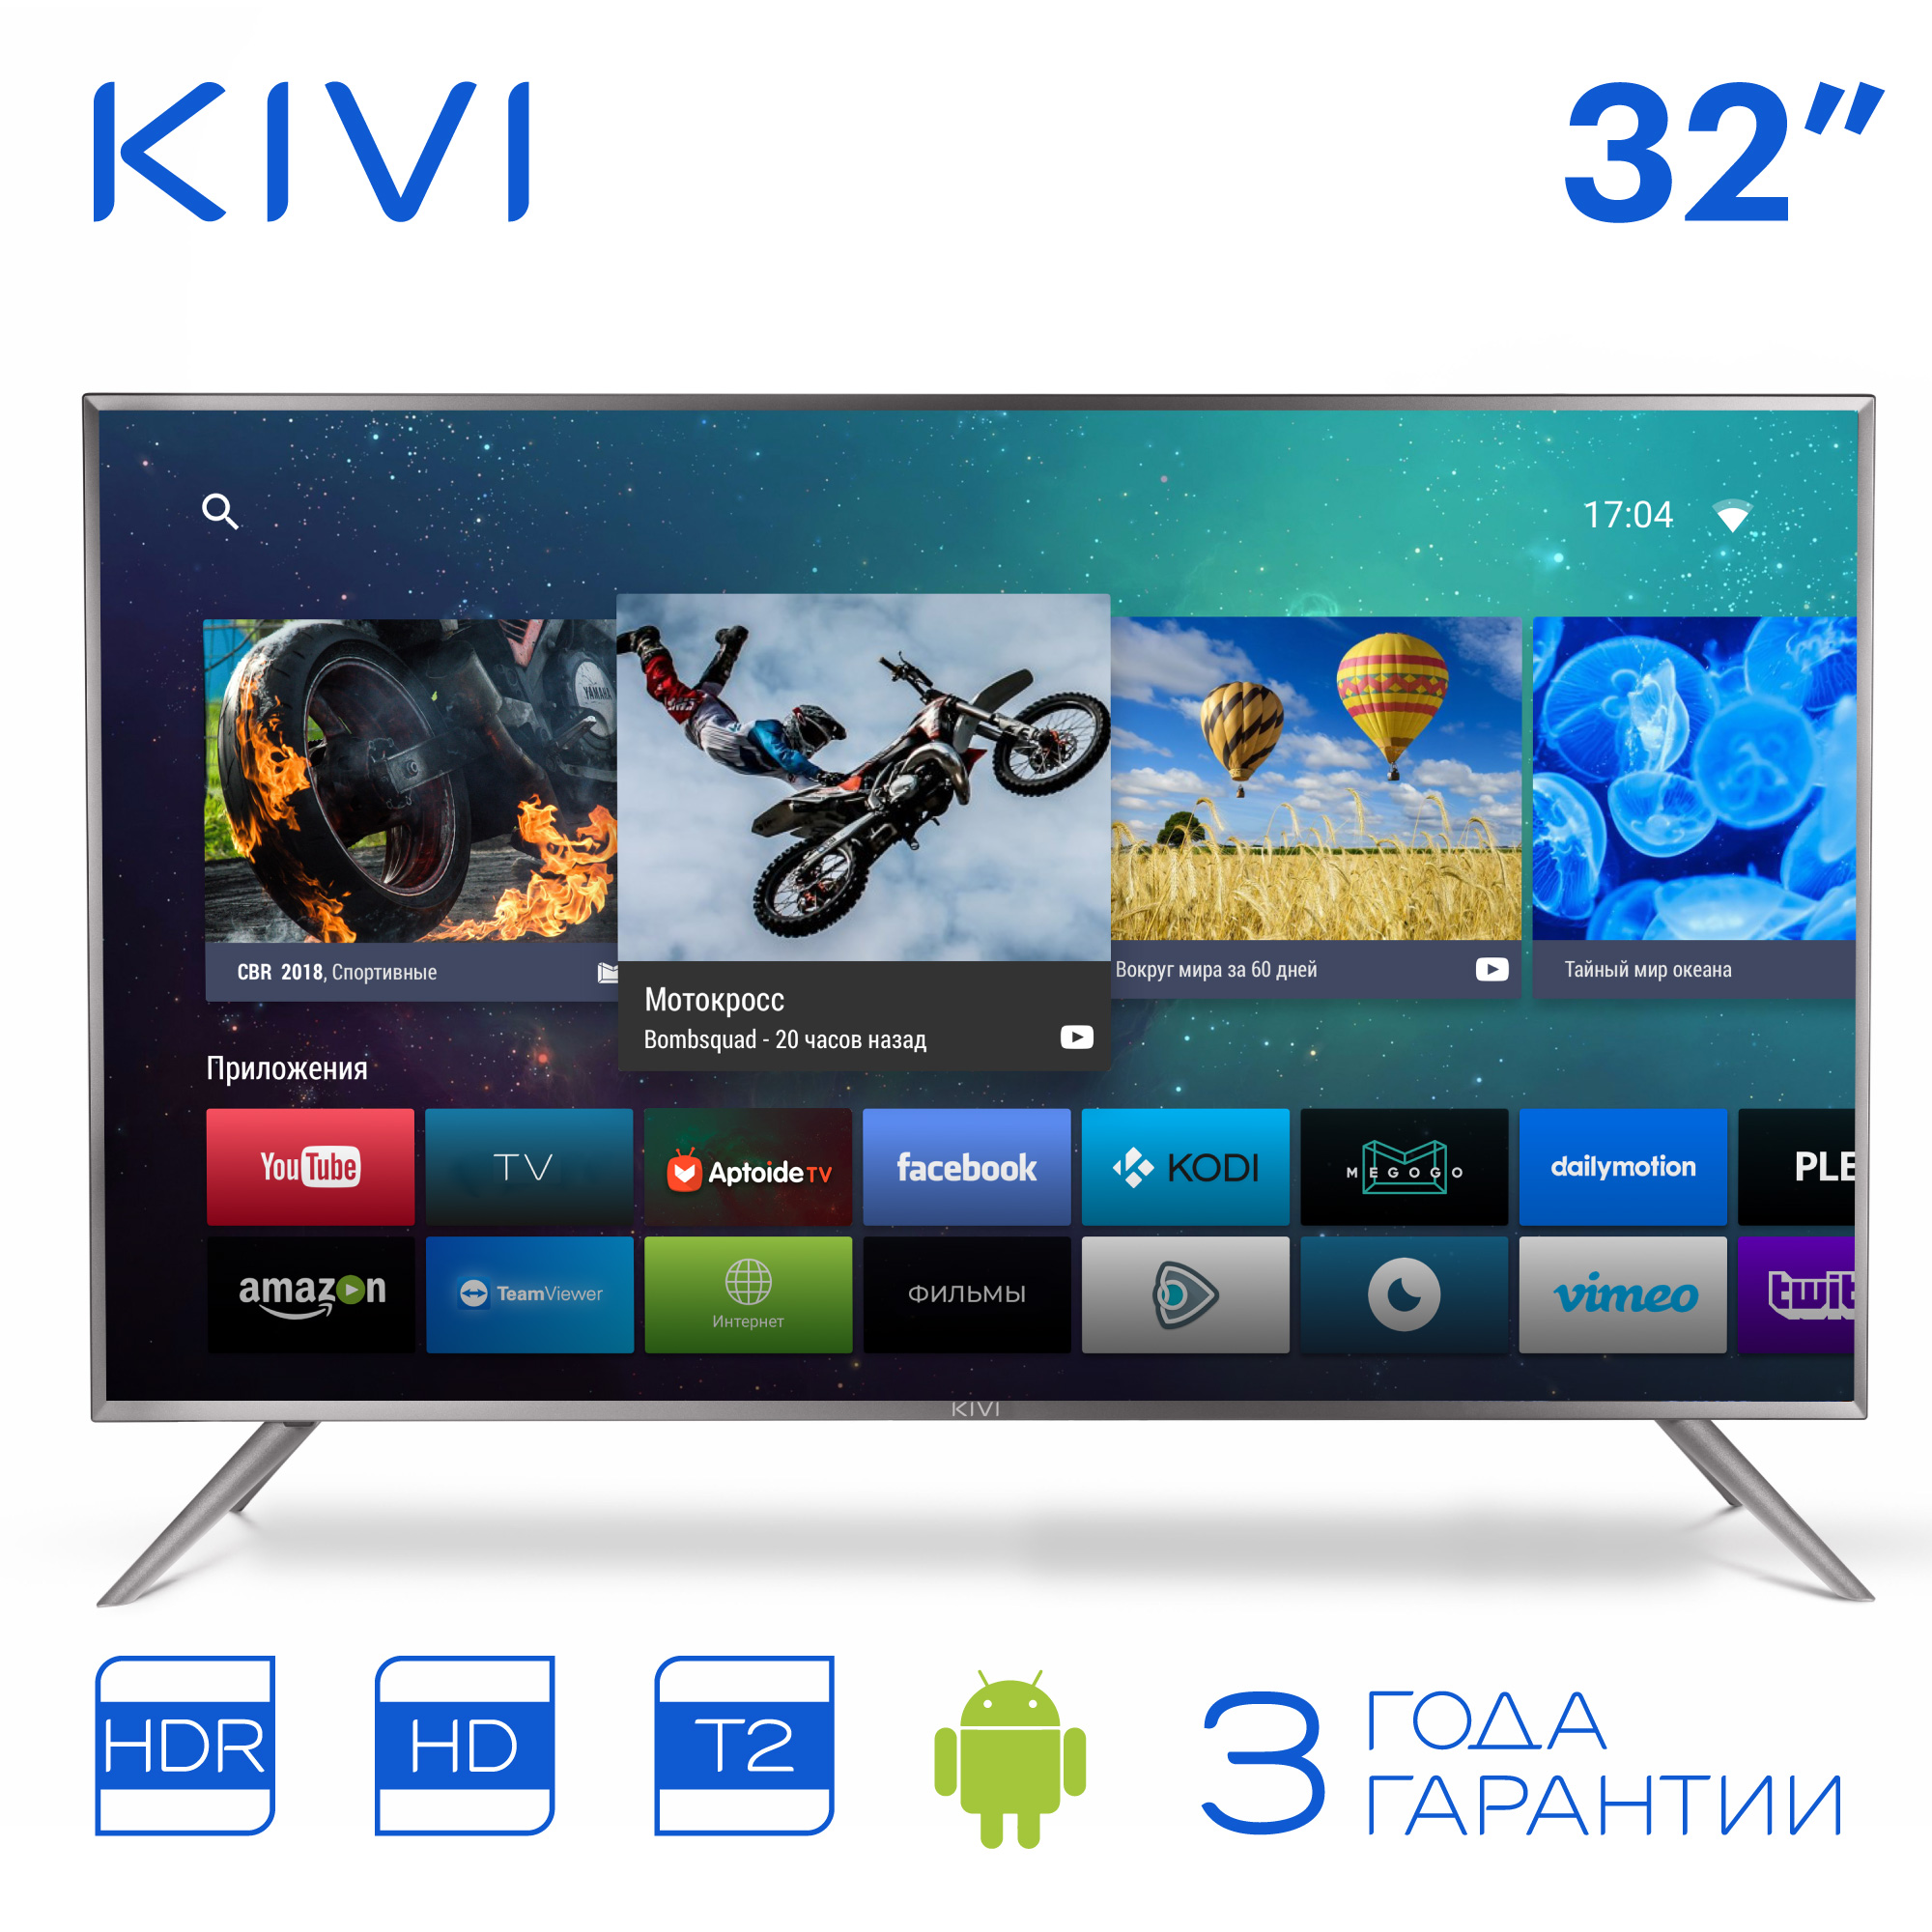 Télévision LED KIVI 32HR50GR HD Smart TV Android HDR 32inchTv dvb numérique dvb-t dvb-t2